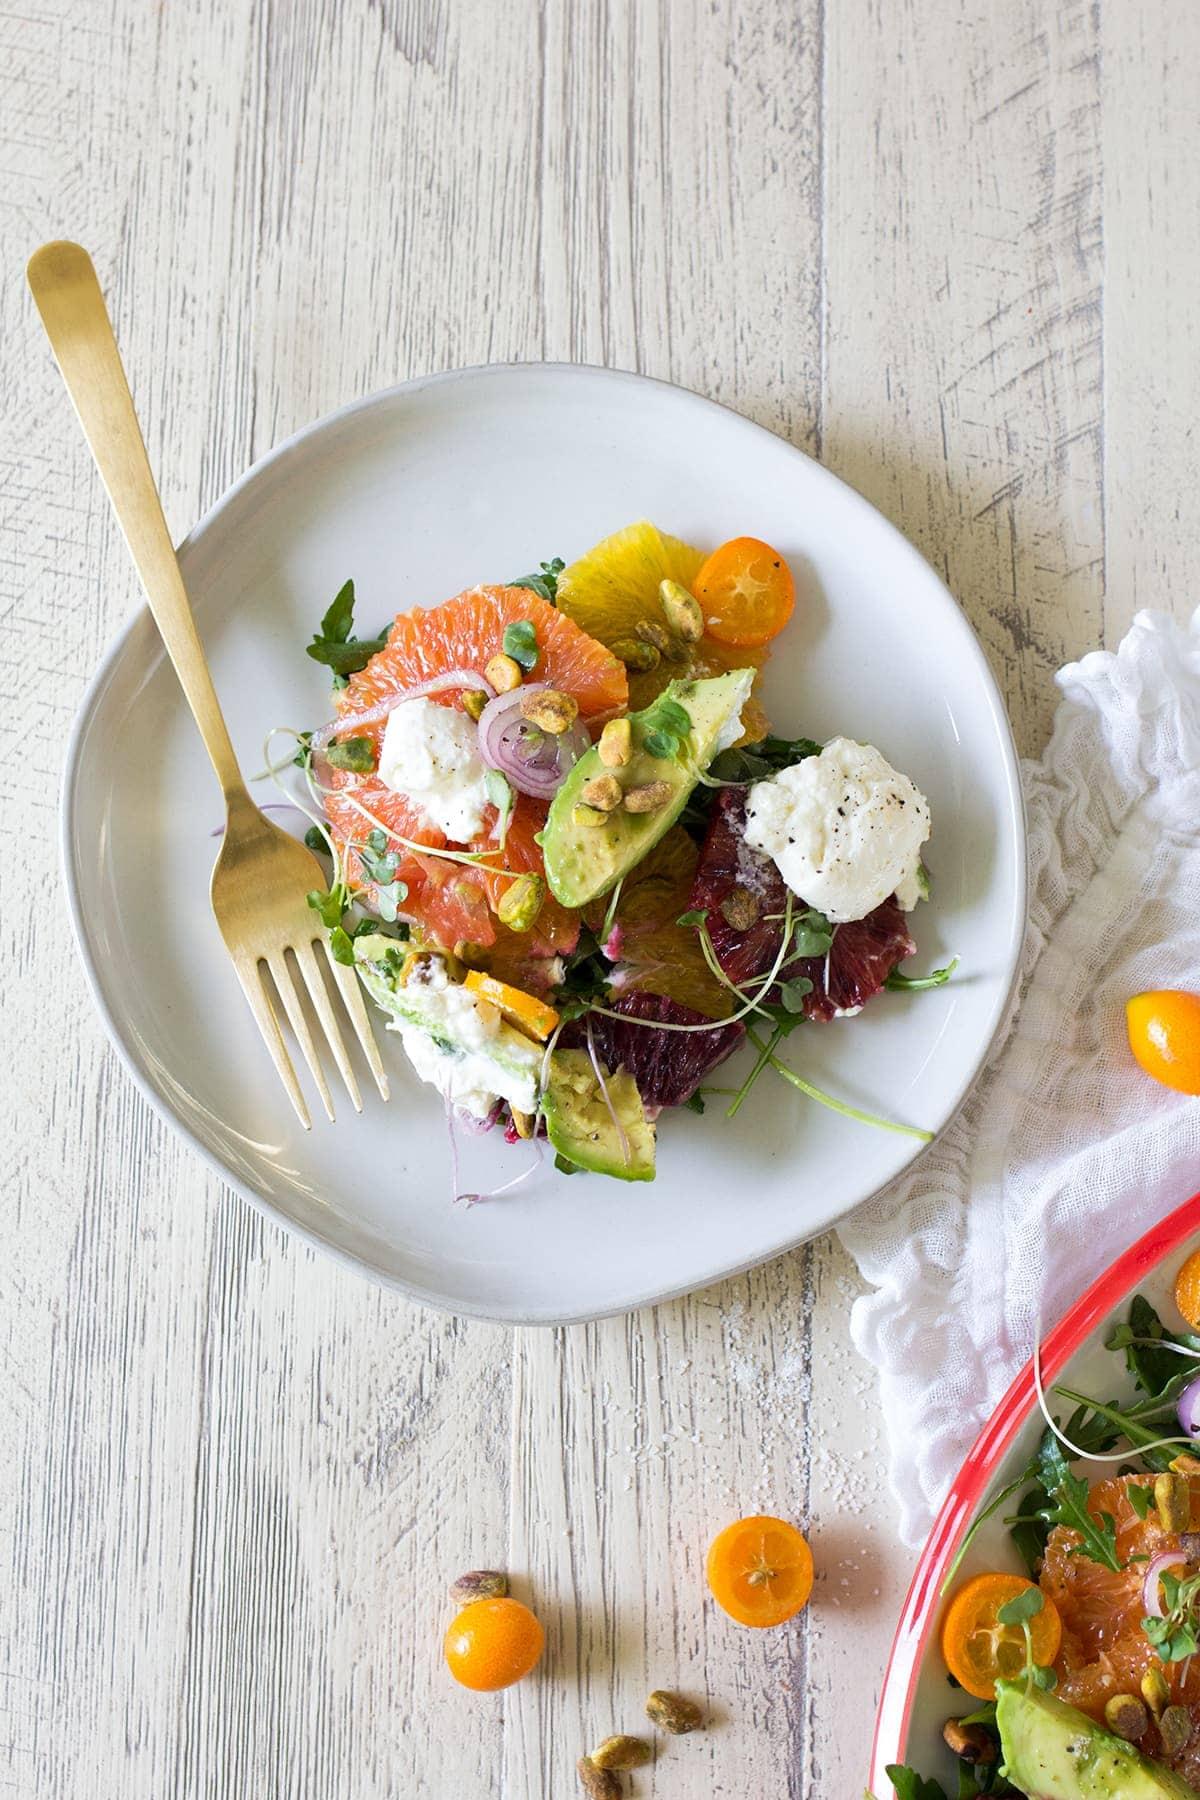 Citrus Salad with Burrata and Marinated Shallot Vinaigrette